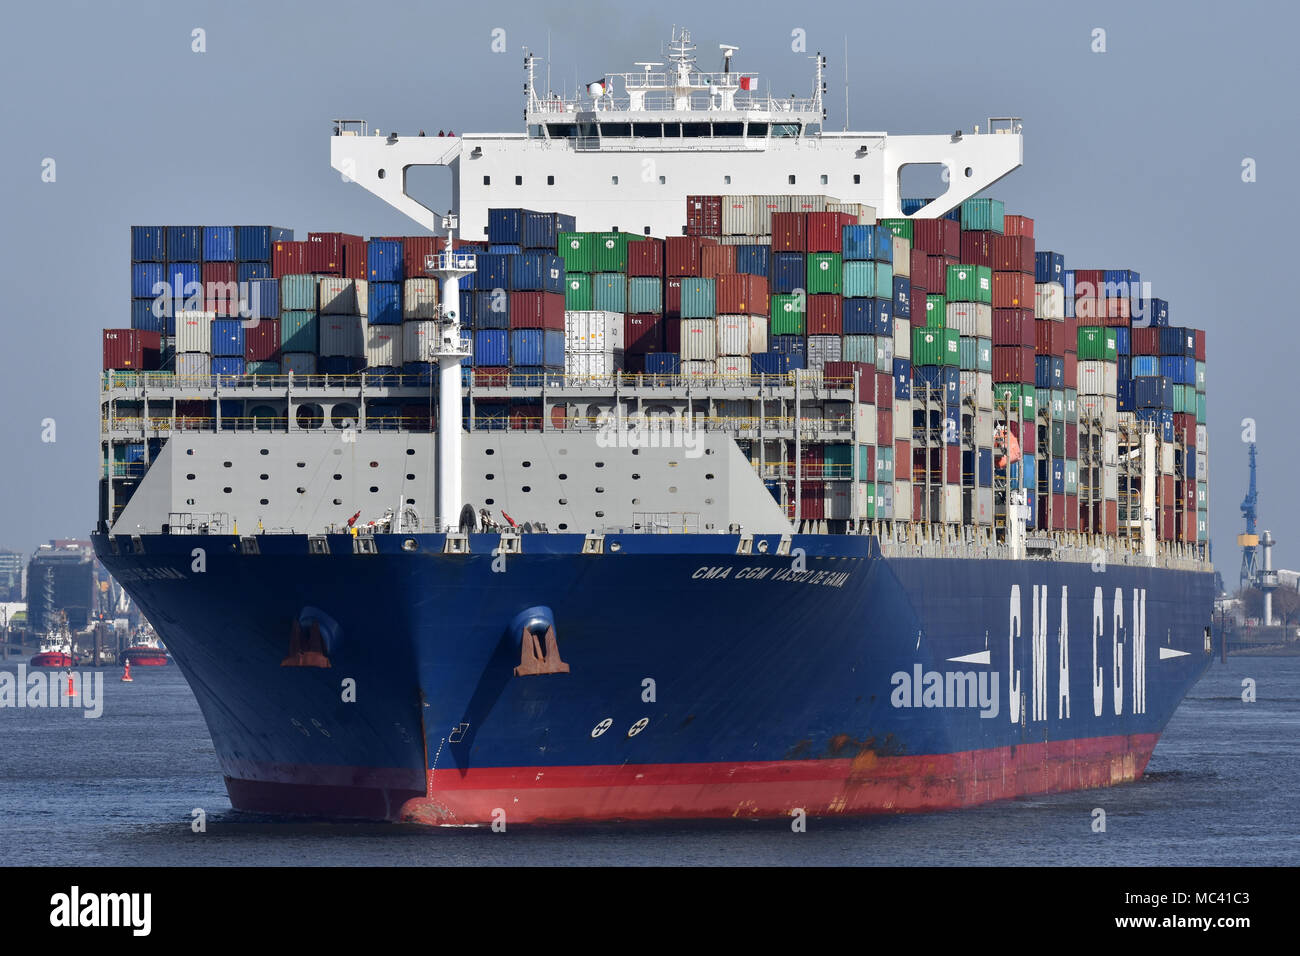 CMA CGM Vasco de Gama outbound from Hamburg - Stock Image